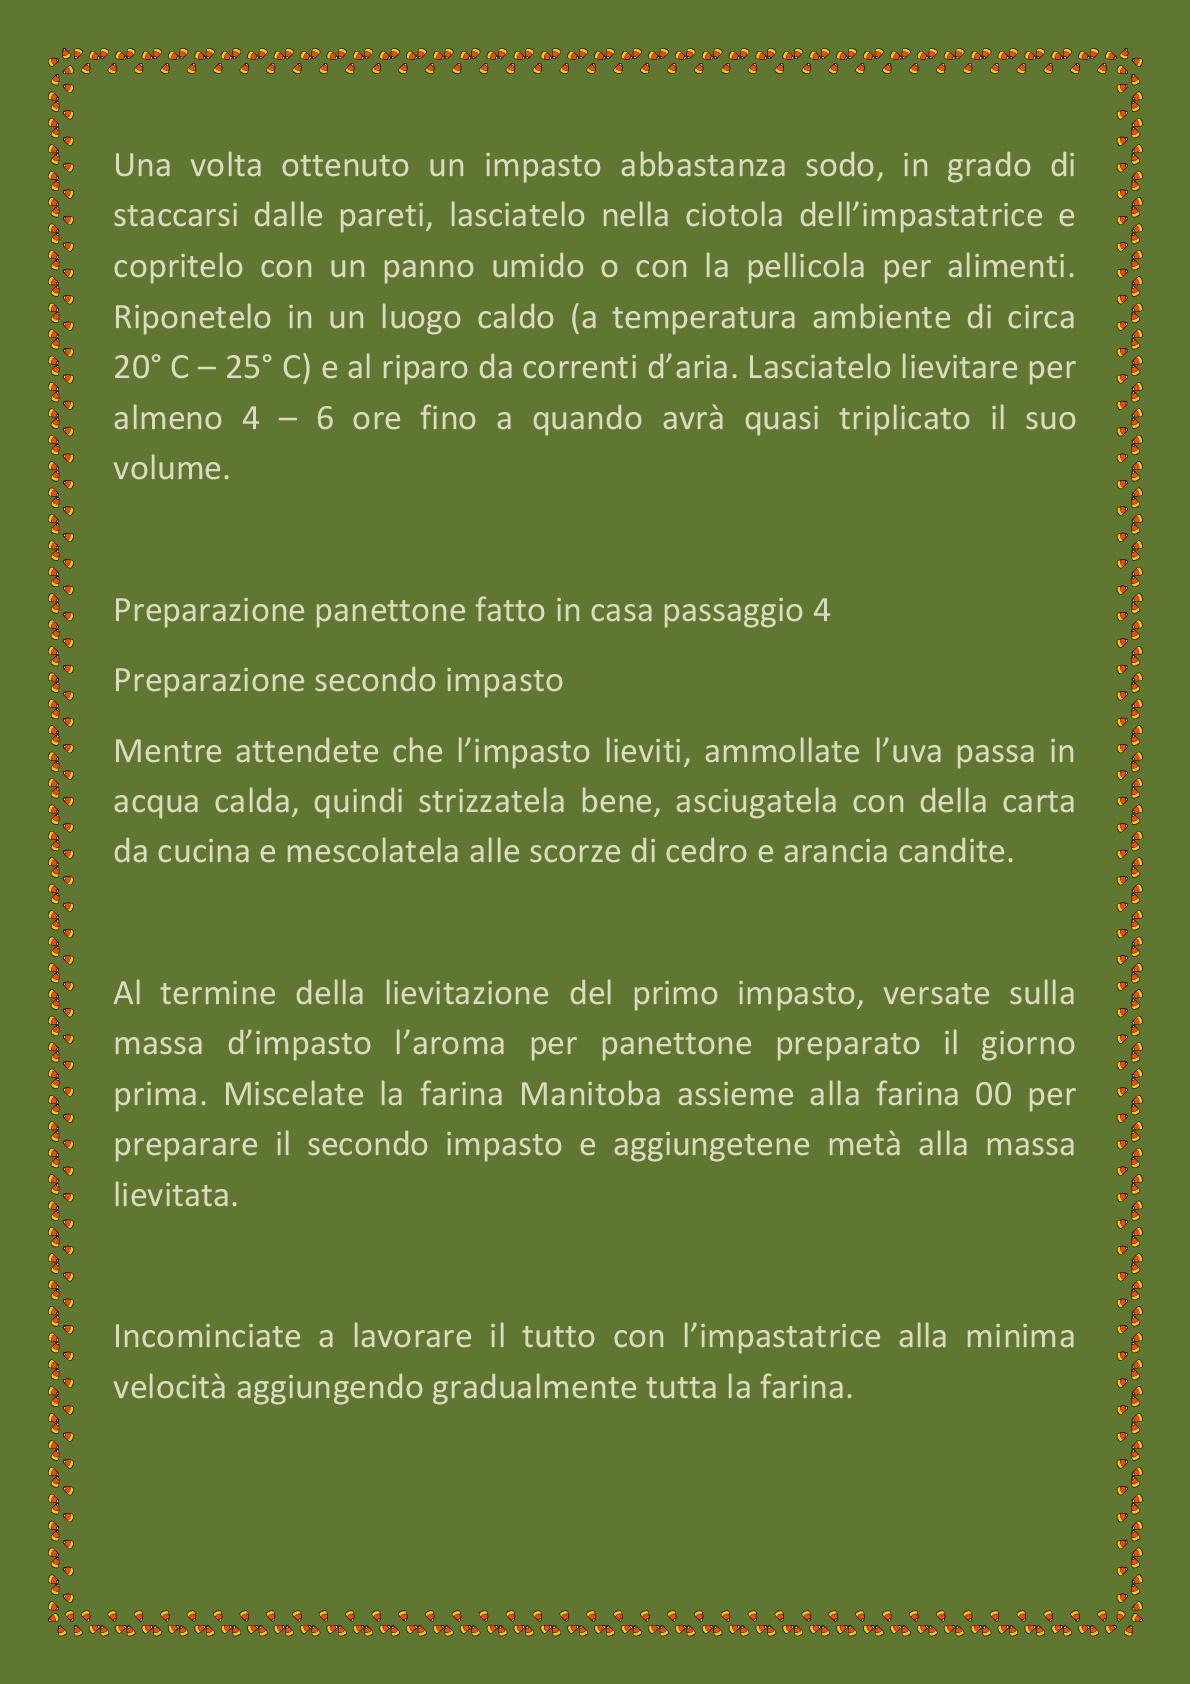 IL-RICETTARIO-(1)-005